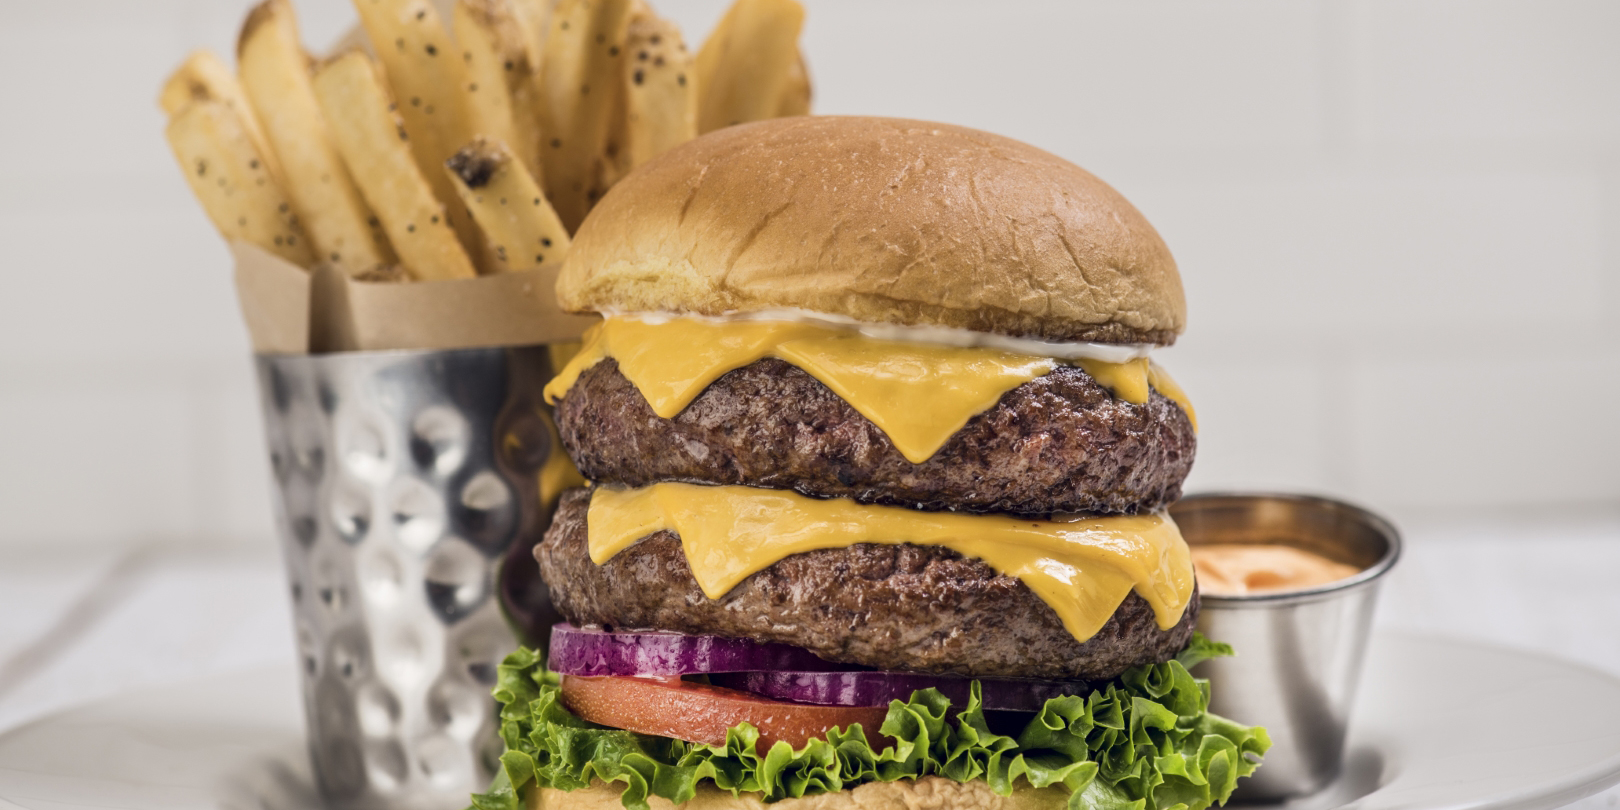 Double Decker Burger Burger from Hard Rock Cafe Bangkok in Siam Square Soi 11, Bangkok